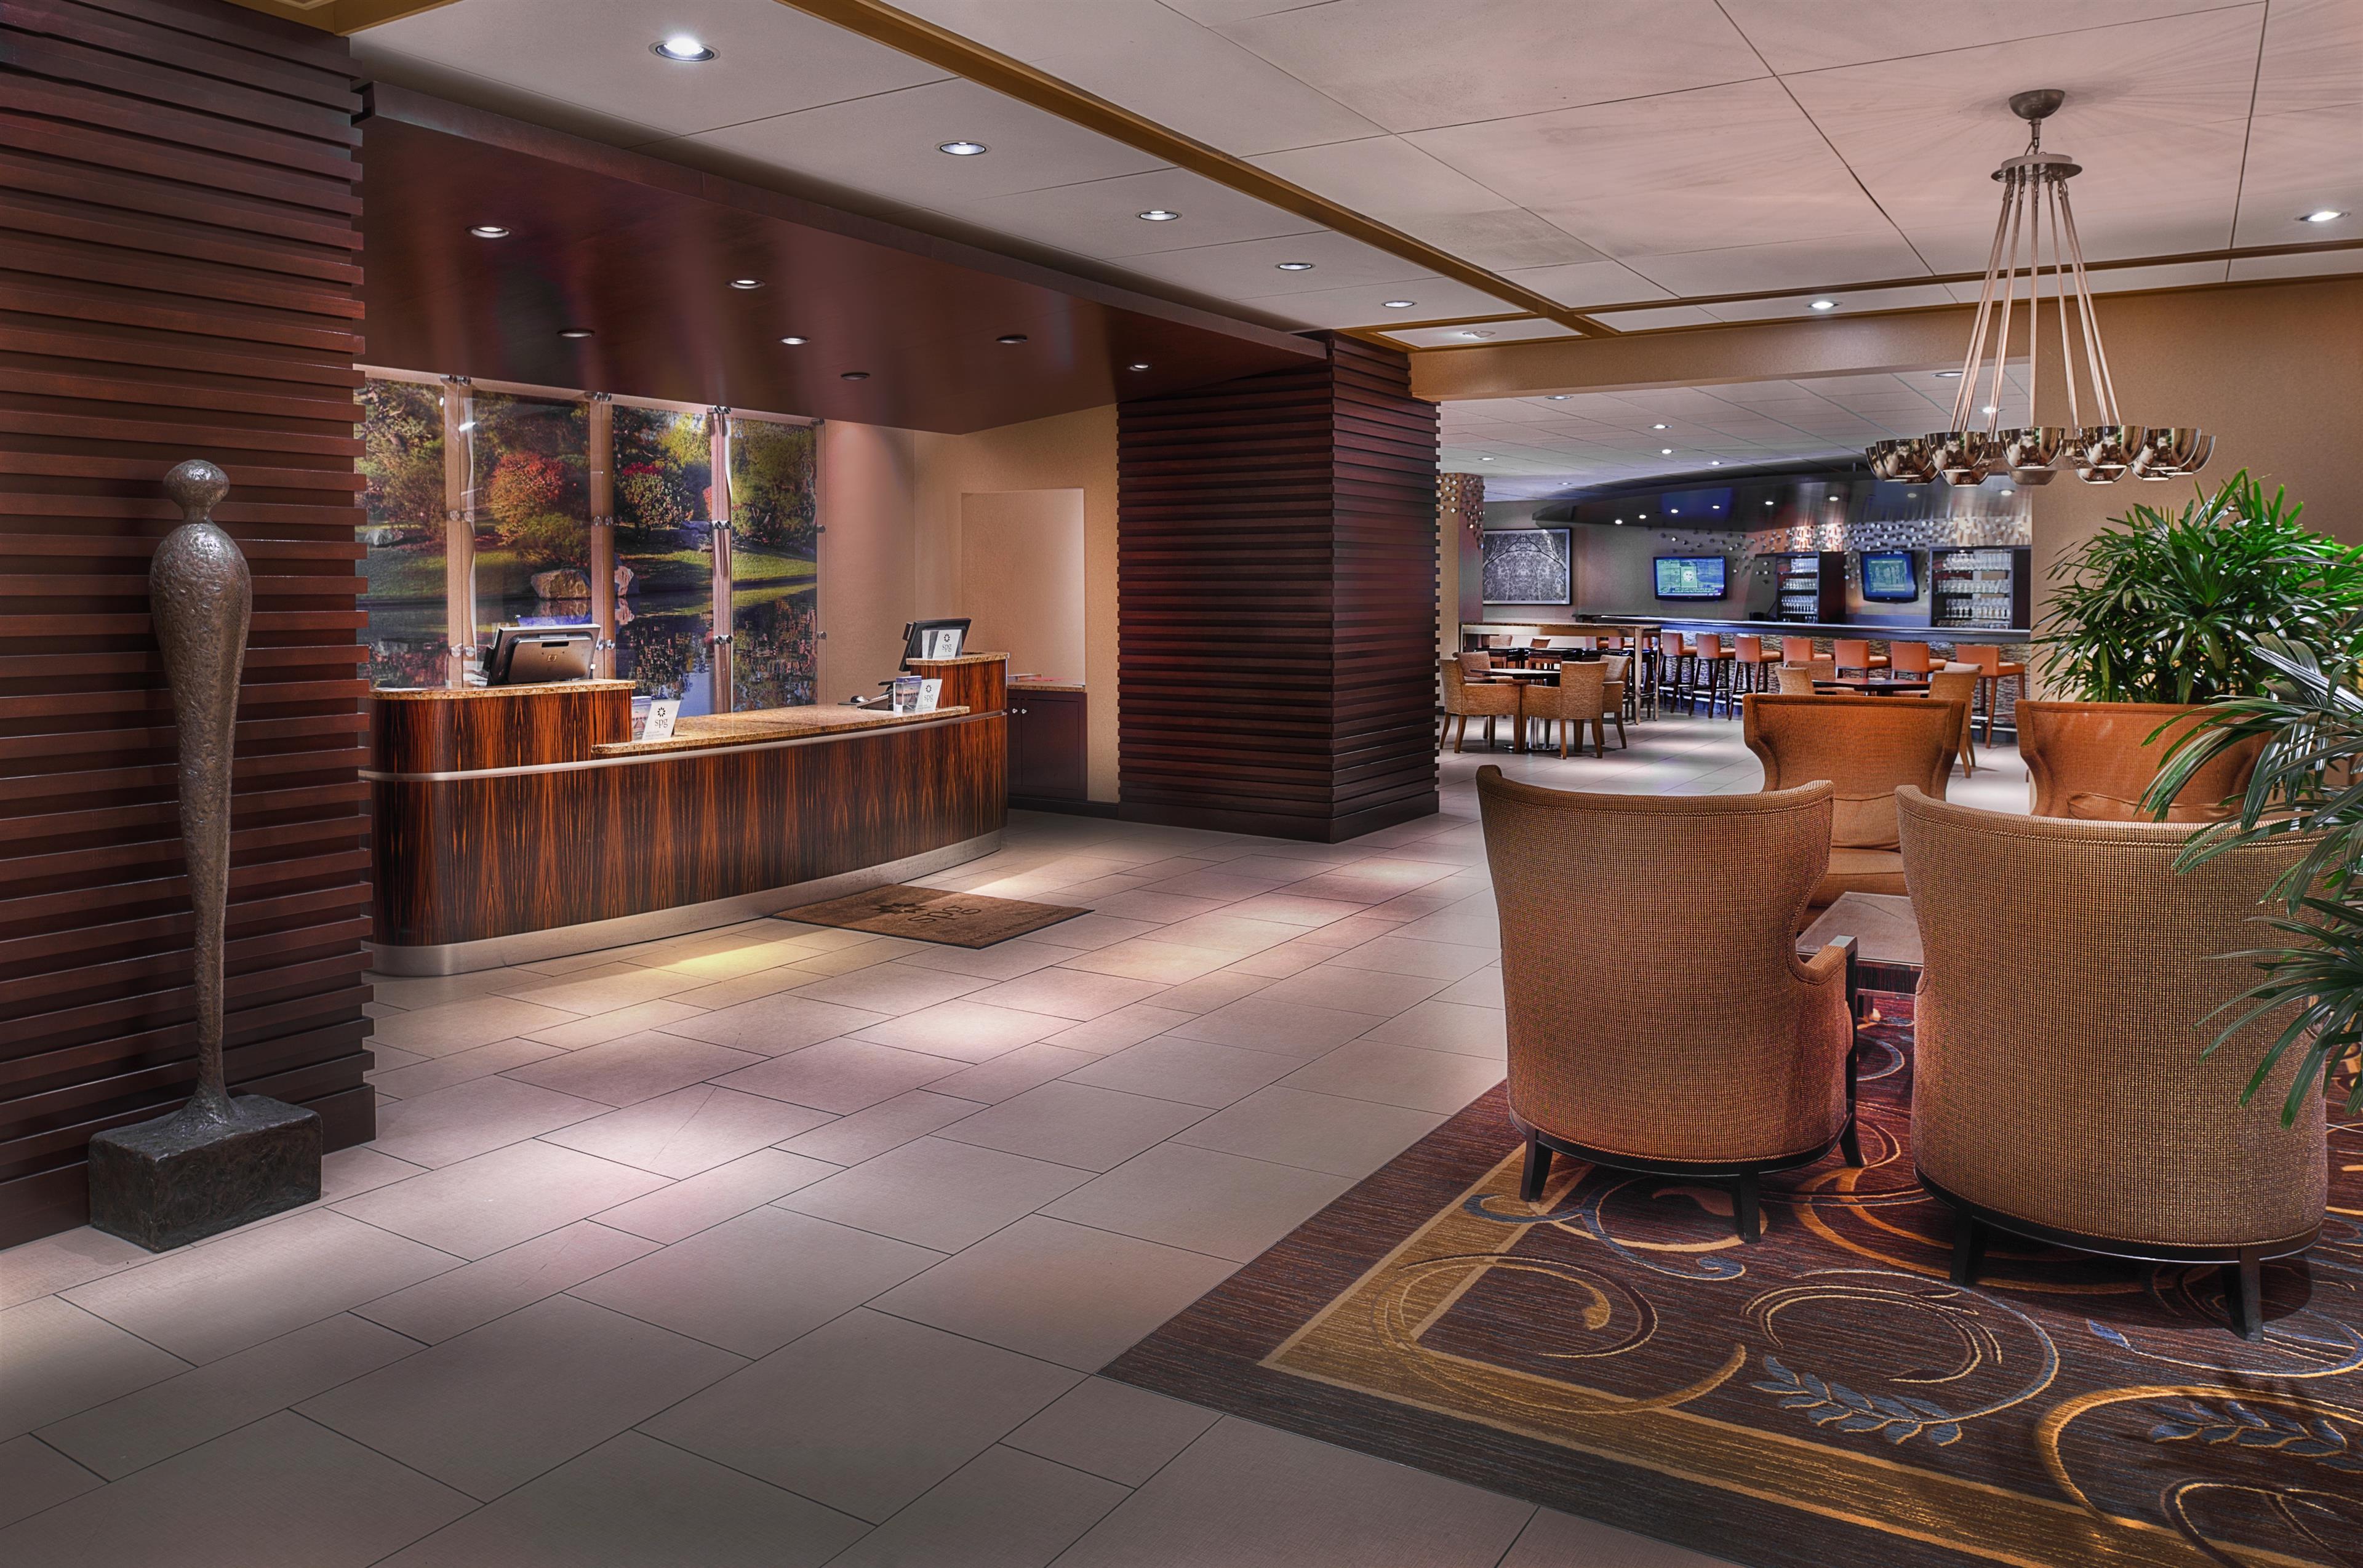 Sheraton Westport Plaza Hotel St. Louis image 24